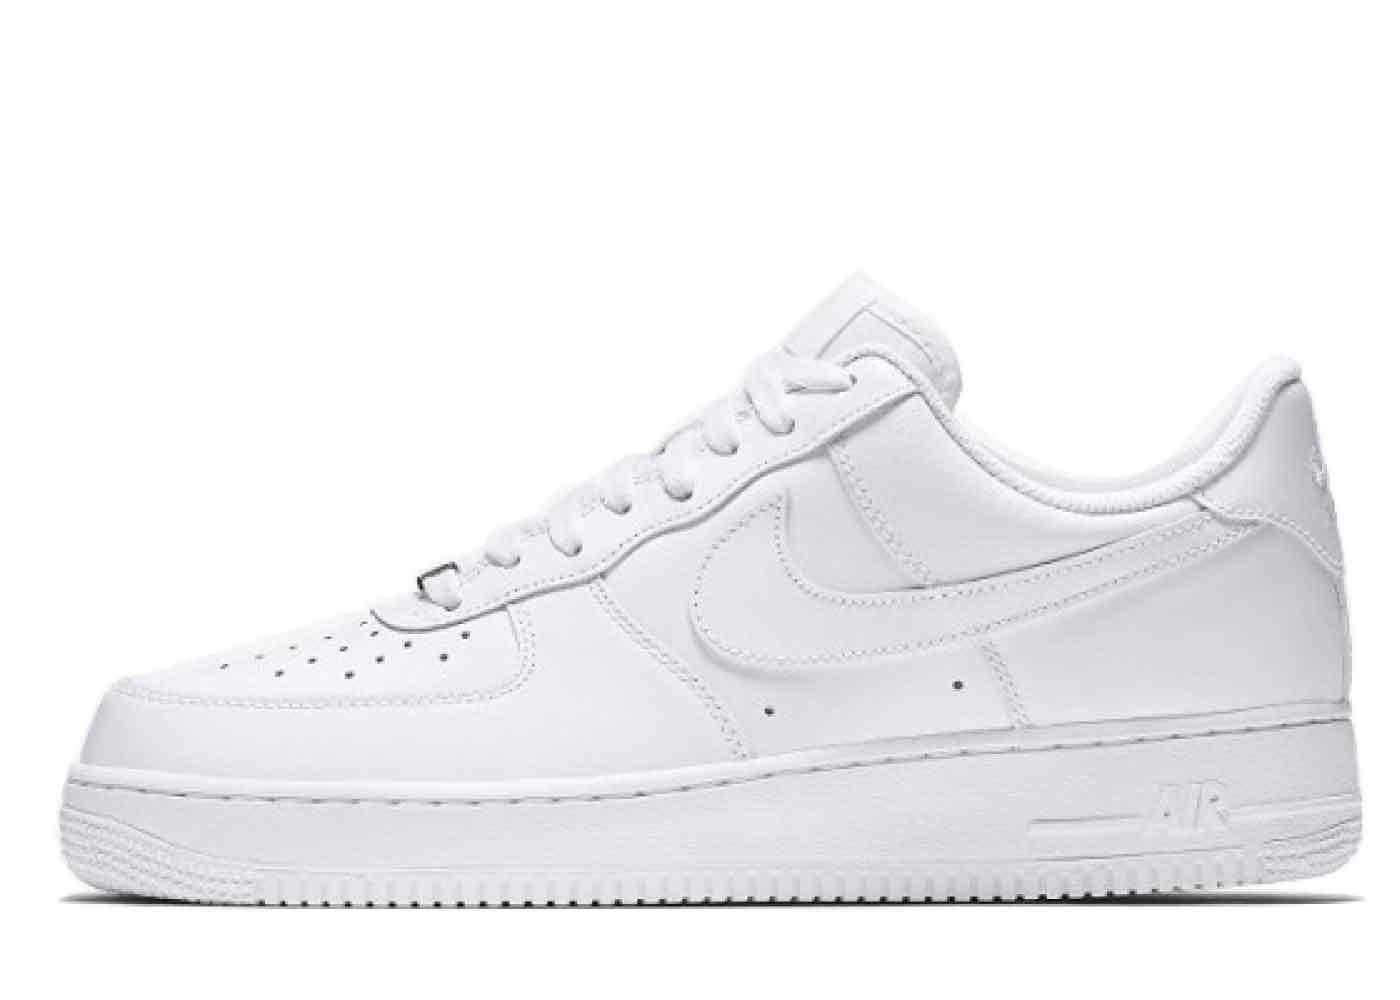 Nike Air Force 1 Low 07 White (315122-111)の写真